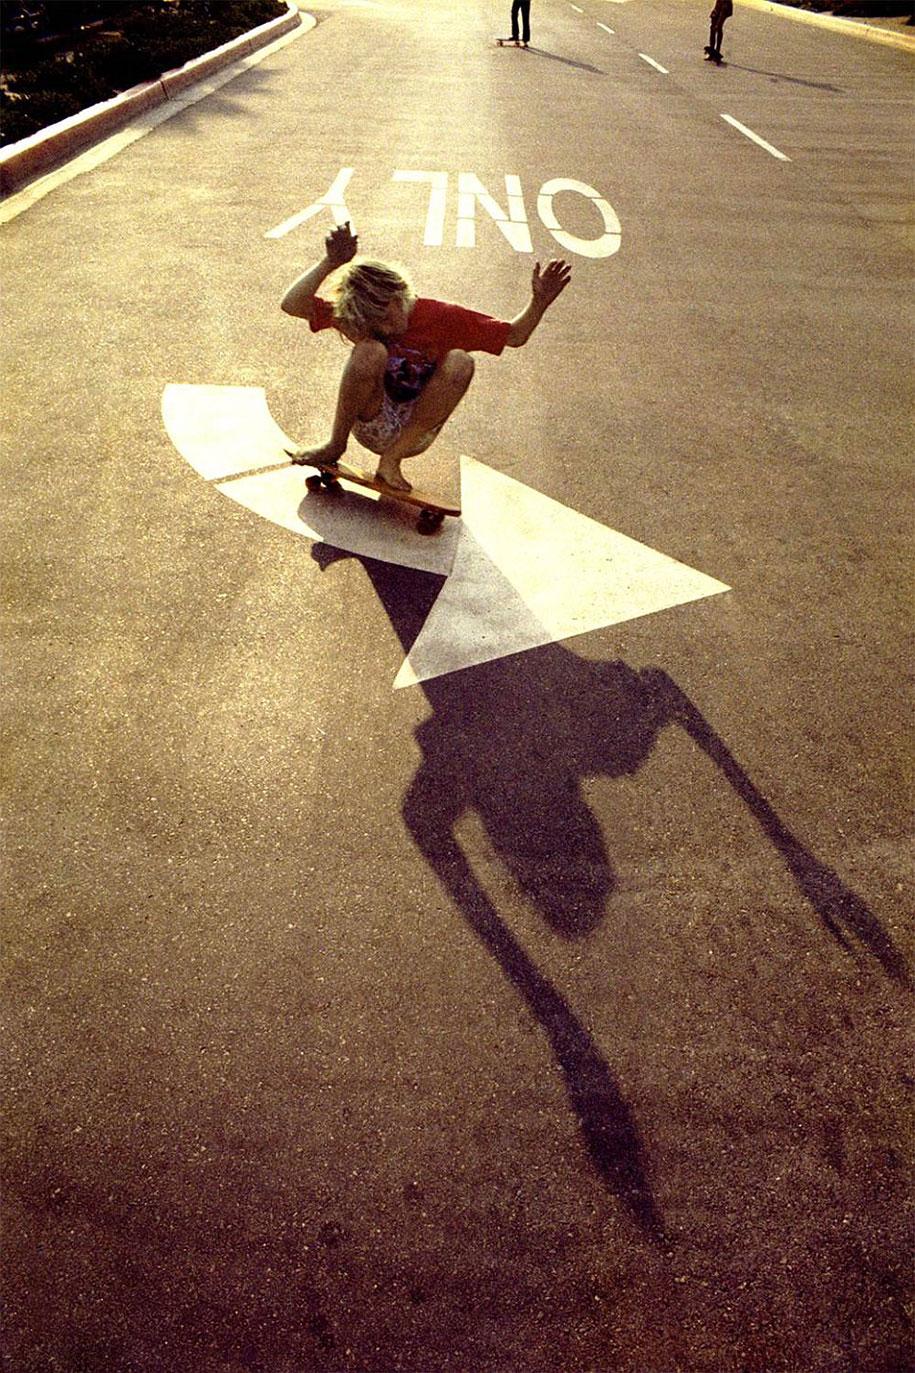 1970-California-skateboard-skater-kids-locals-only-hugh-holland-999